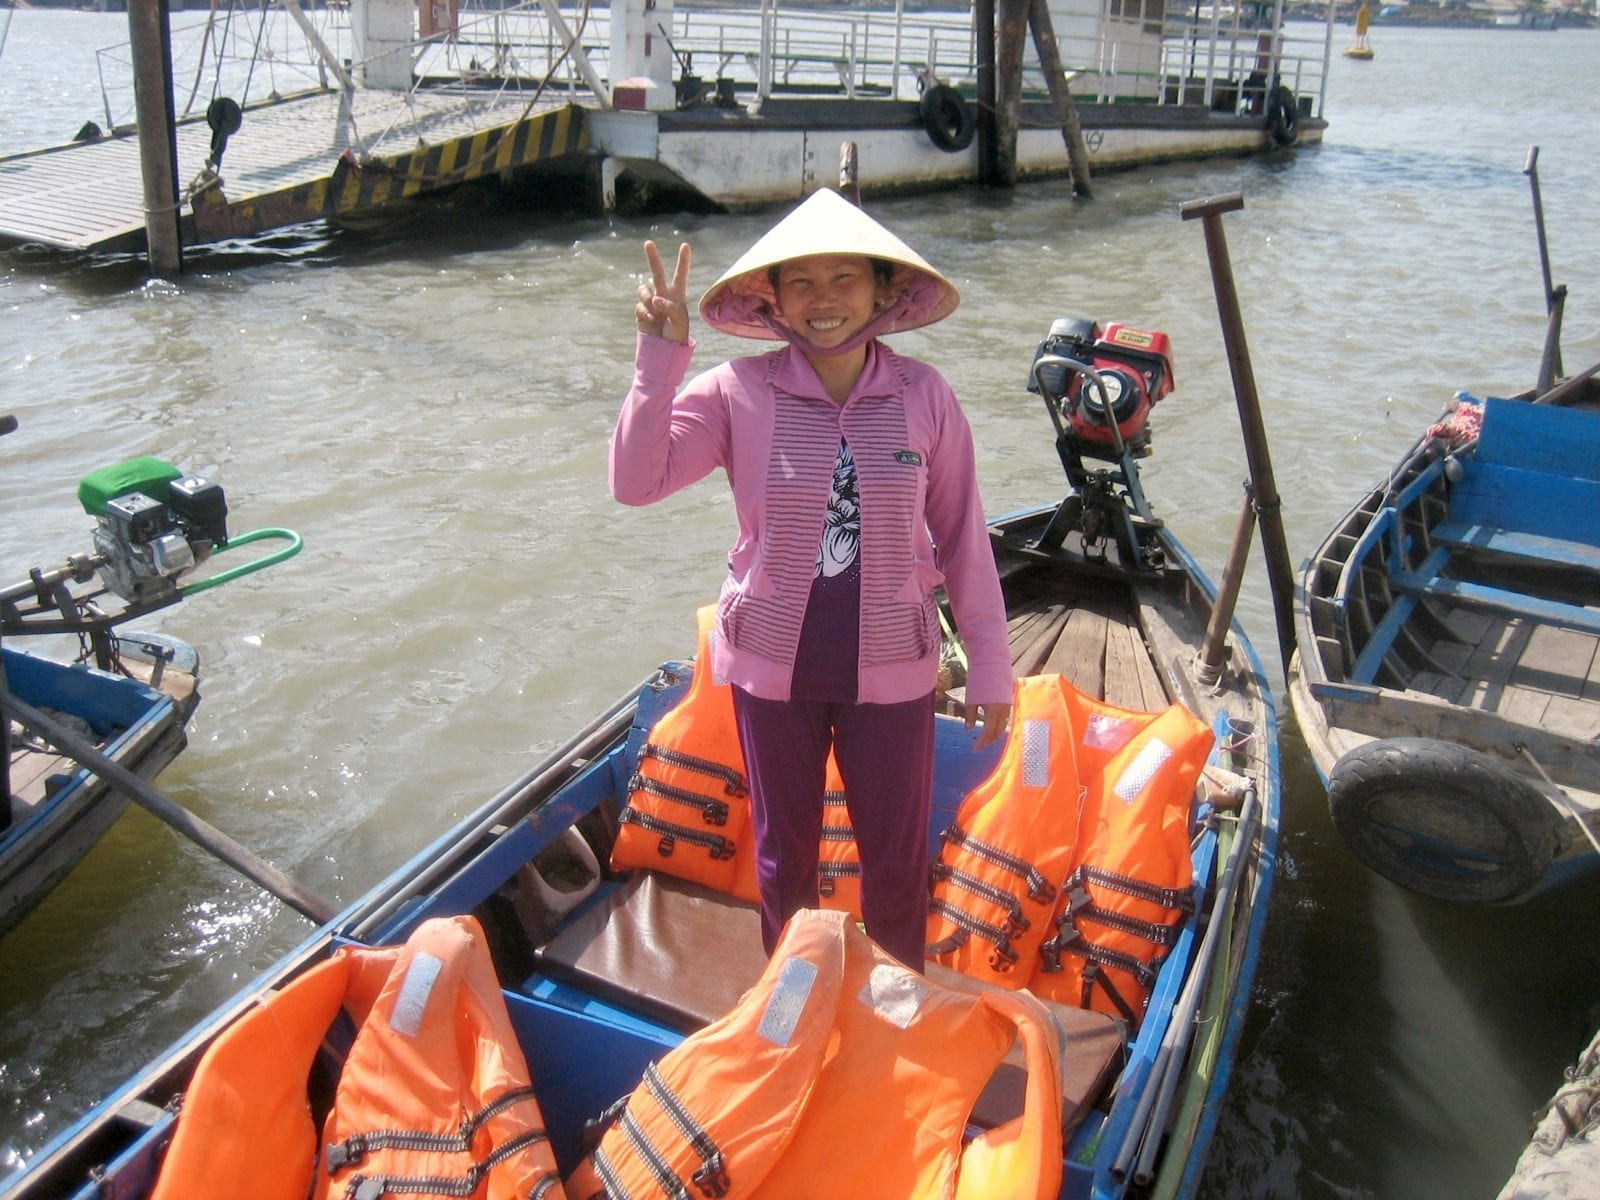 Cần Thơ floating market tour boat operator